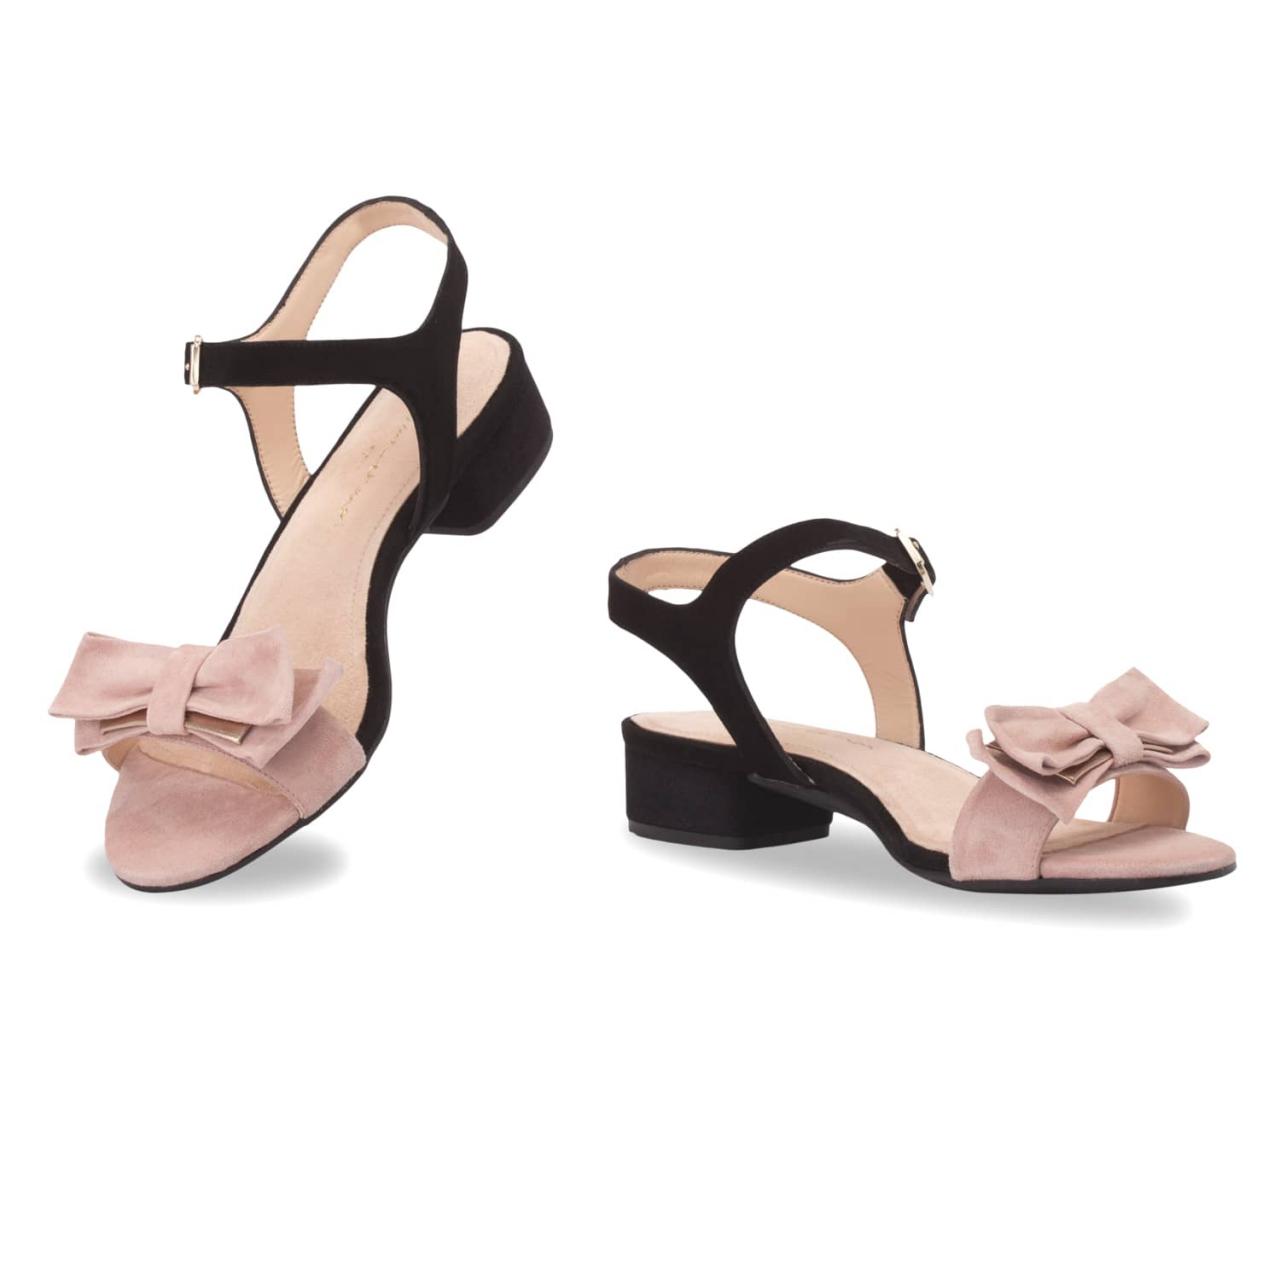 Black & Rose Nude / Stiletto 7cm